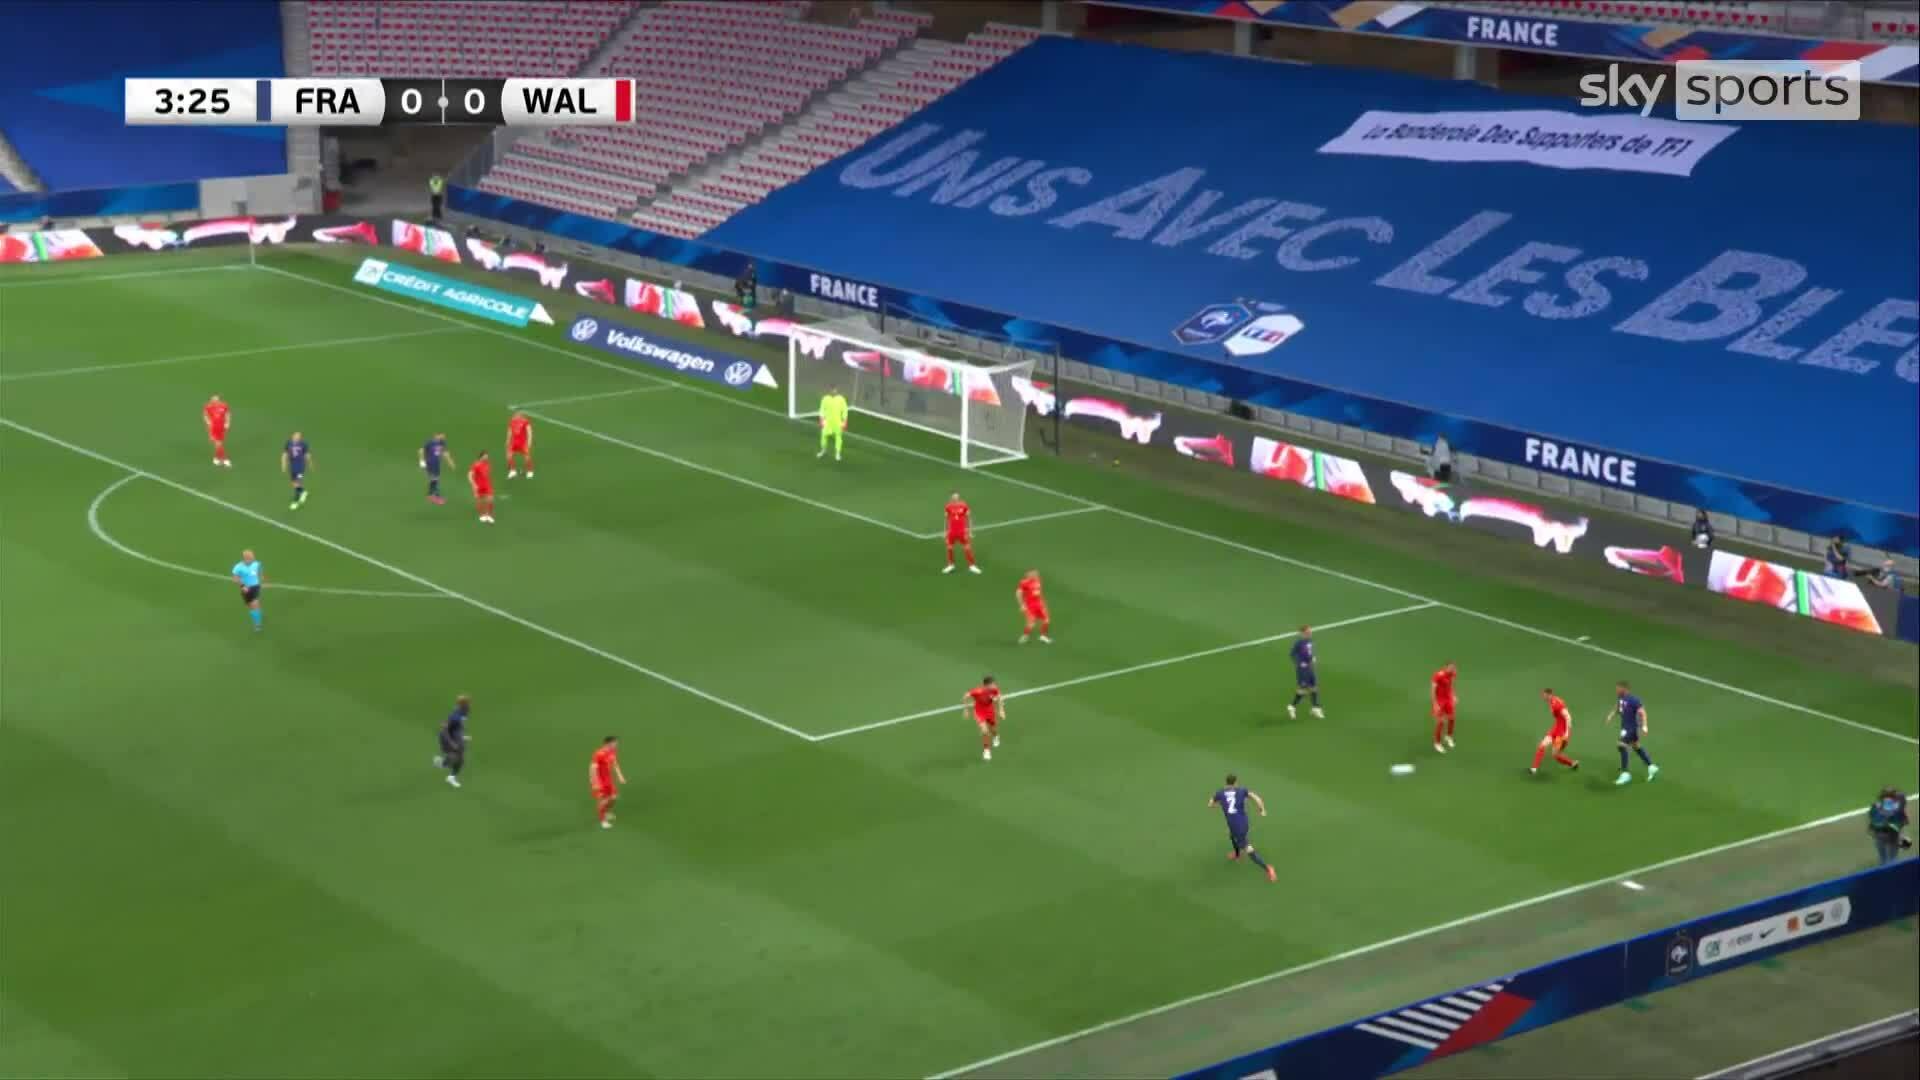 Pháp 3-0 xứ Wales